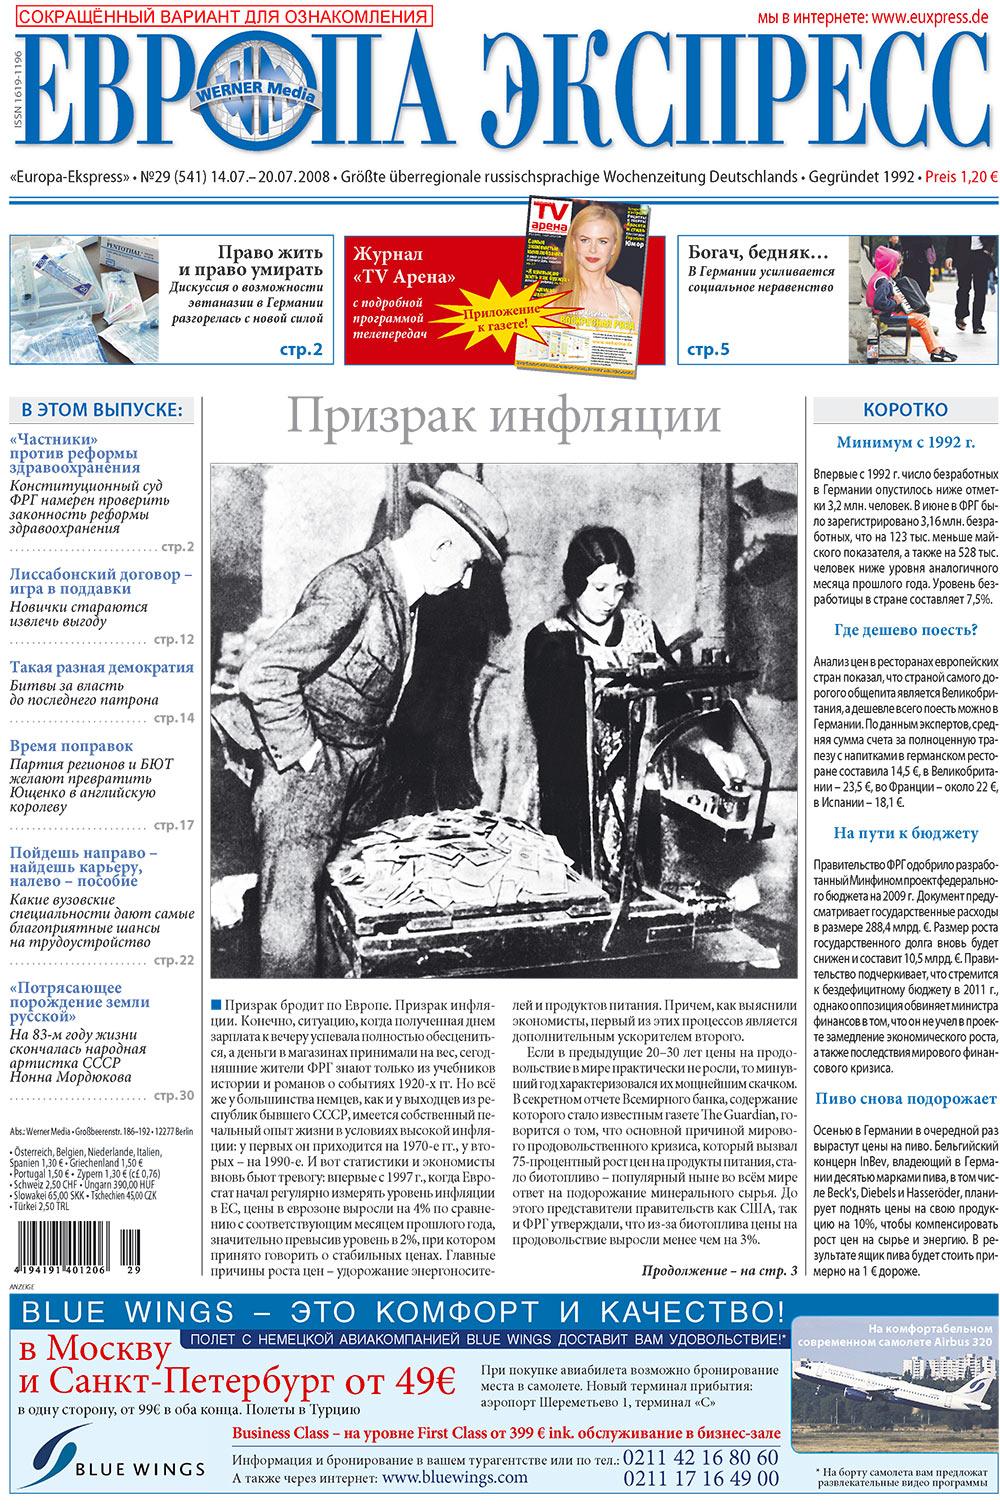 Европа экспресс (газета). 2008 год, номер 29, стр. 1